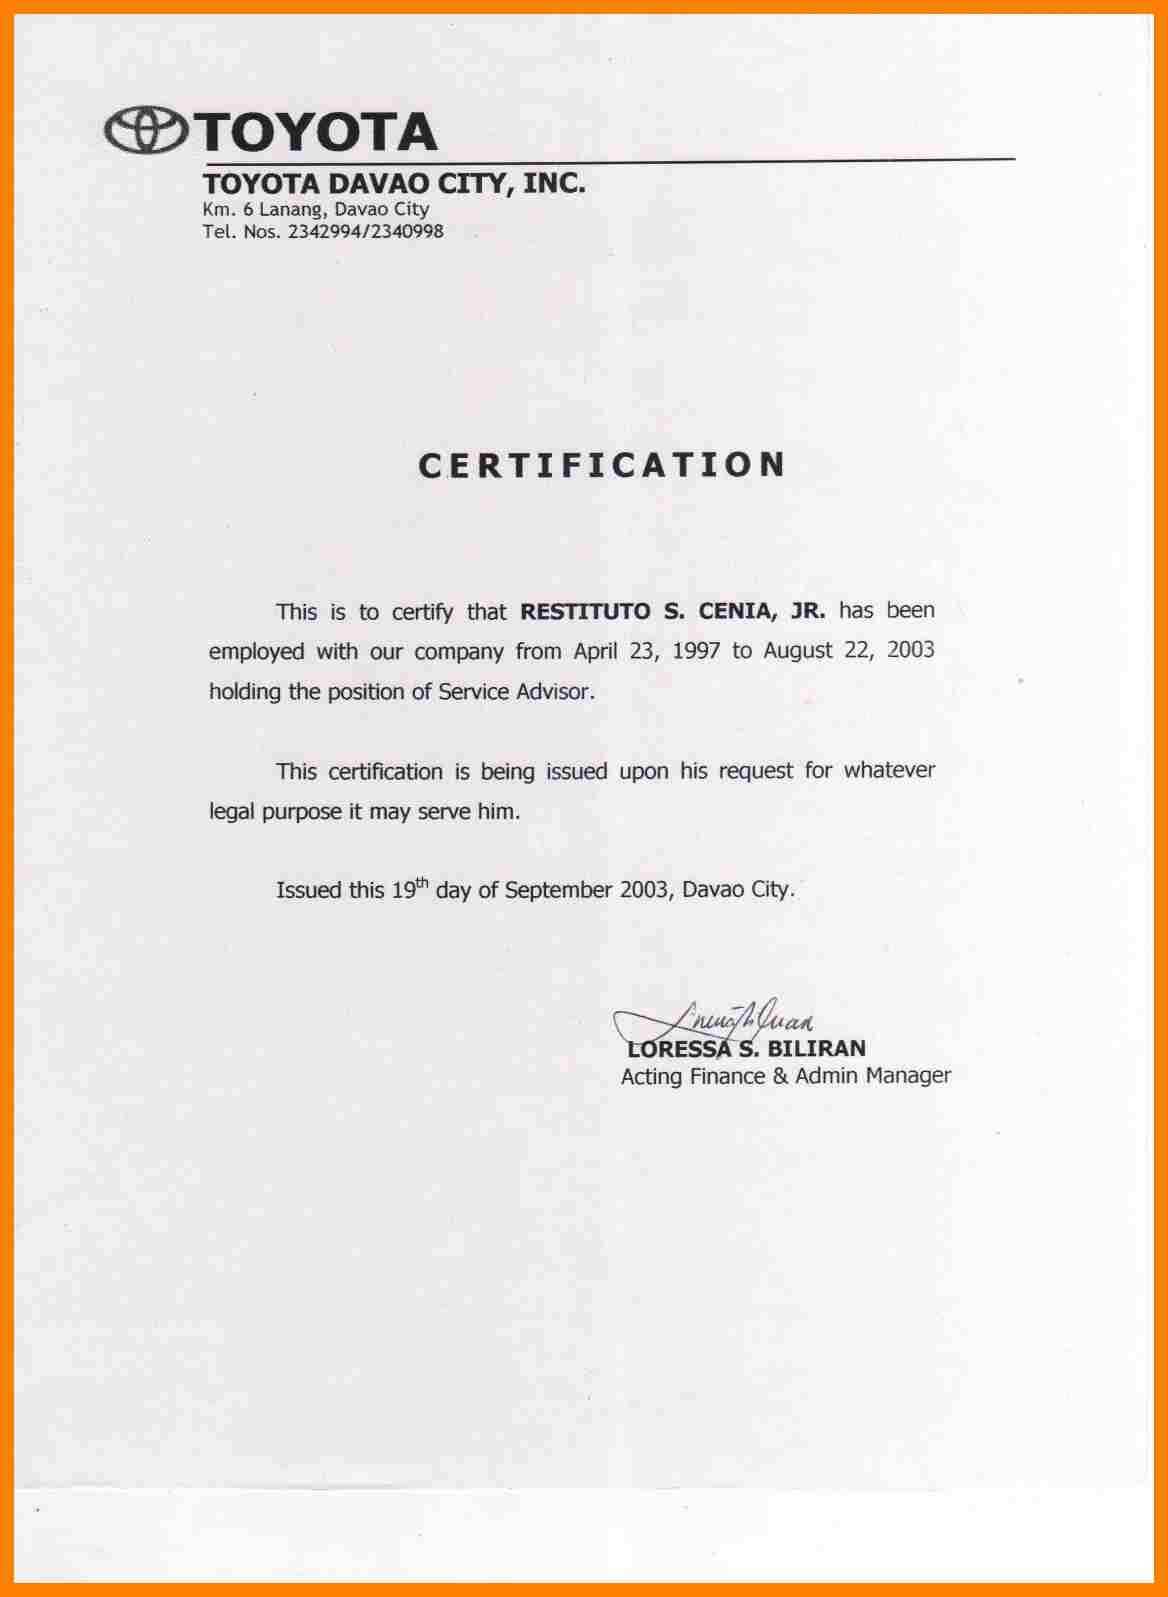 Certificate Employment Template 5 – Elsik Blue Cetane Throughout Sample Certificate Employment Template